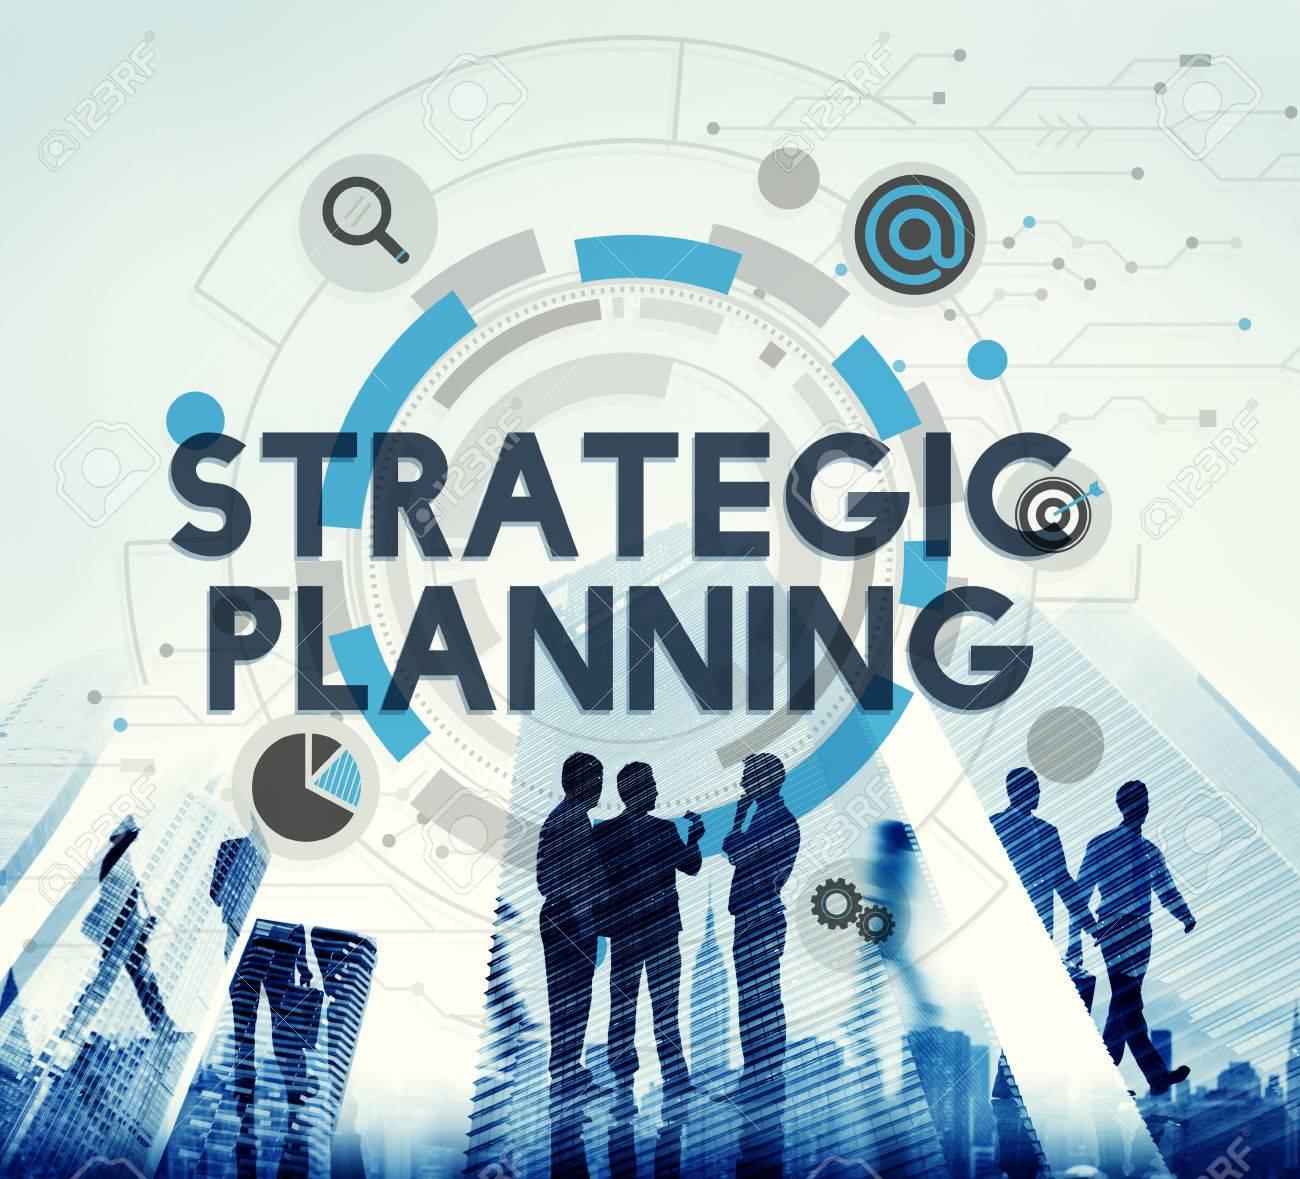 Strategic Planning Process Action Plan Concept - 54642614